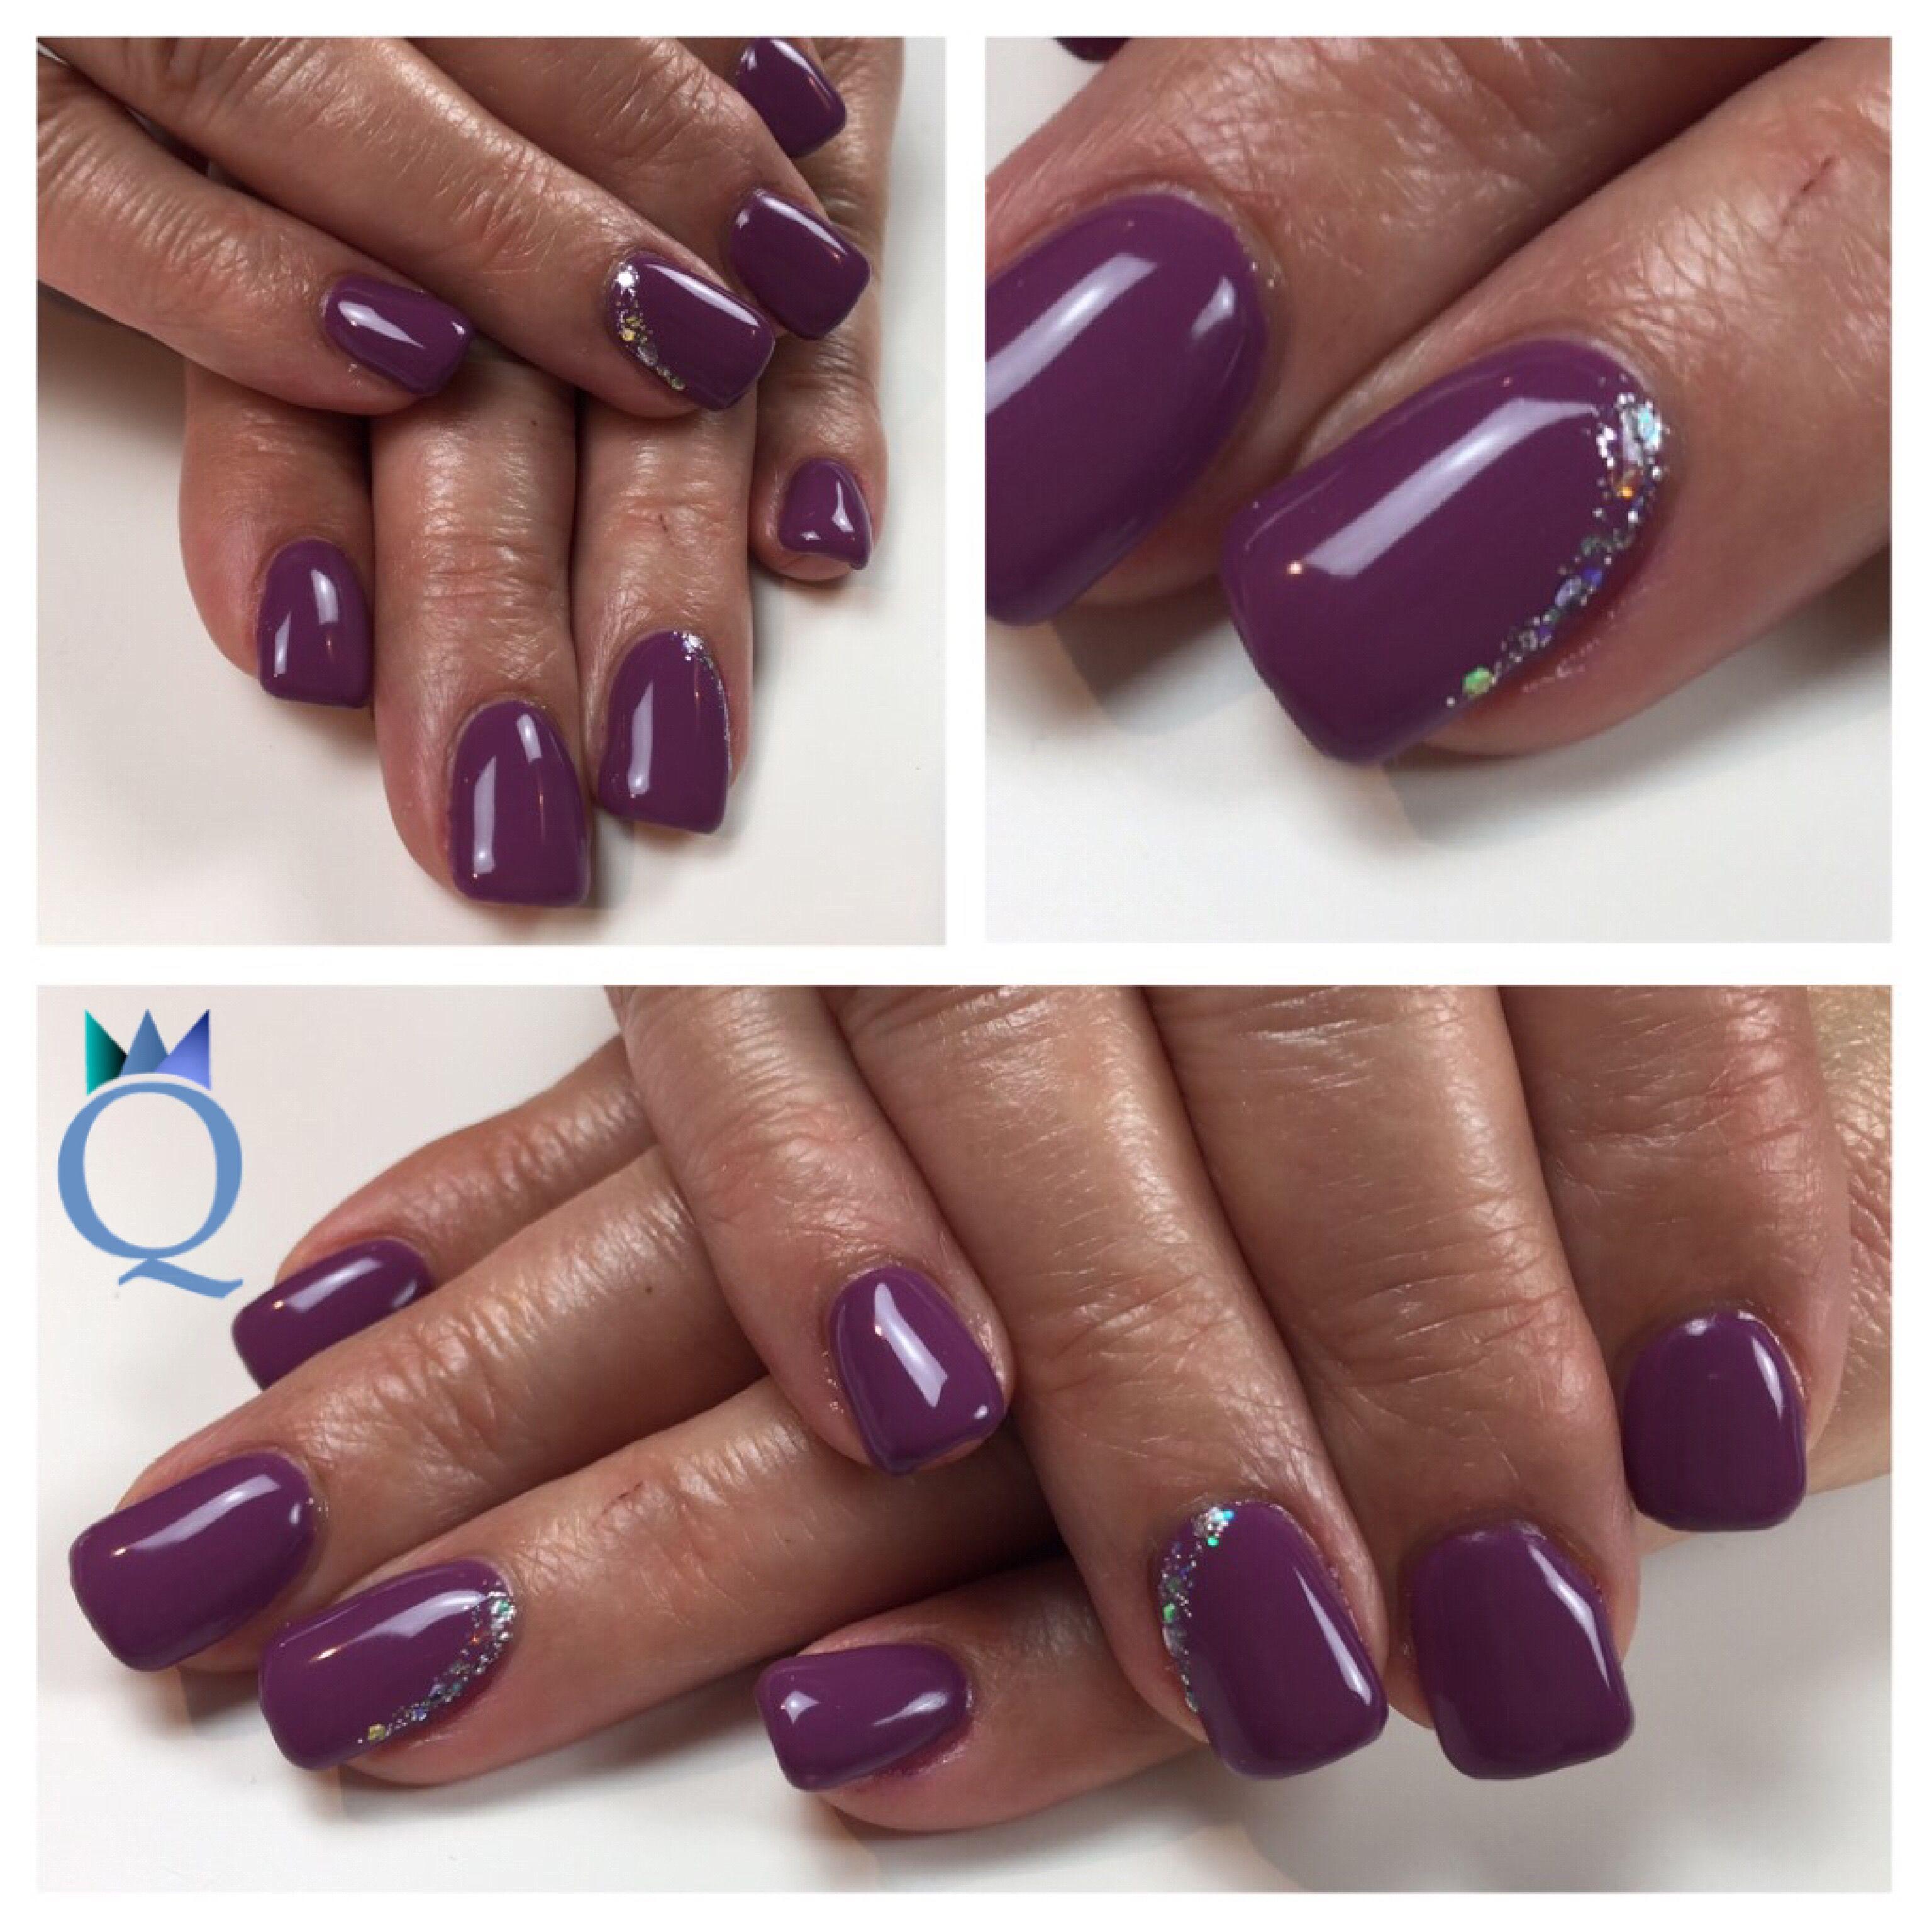 shortnails gelnails nails purple rainbow glitter kurzen gel geln gel n gel violett. Black Bedroom Furniture Sets. Home Design Ideas